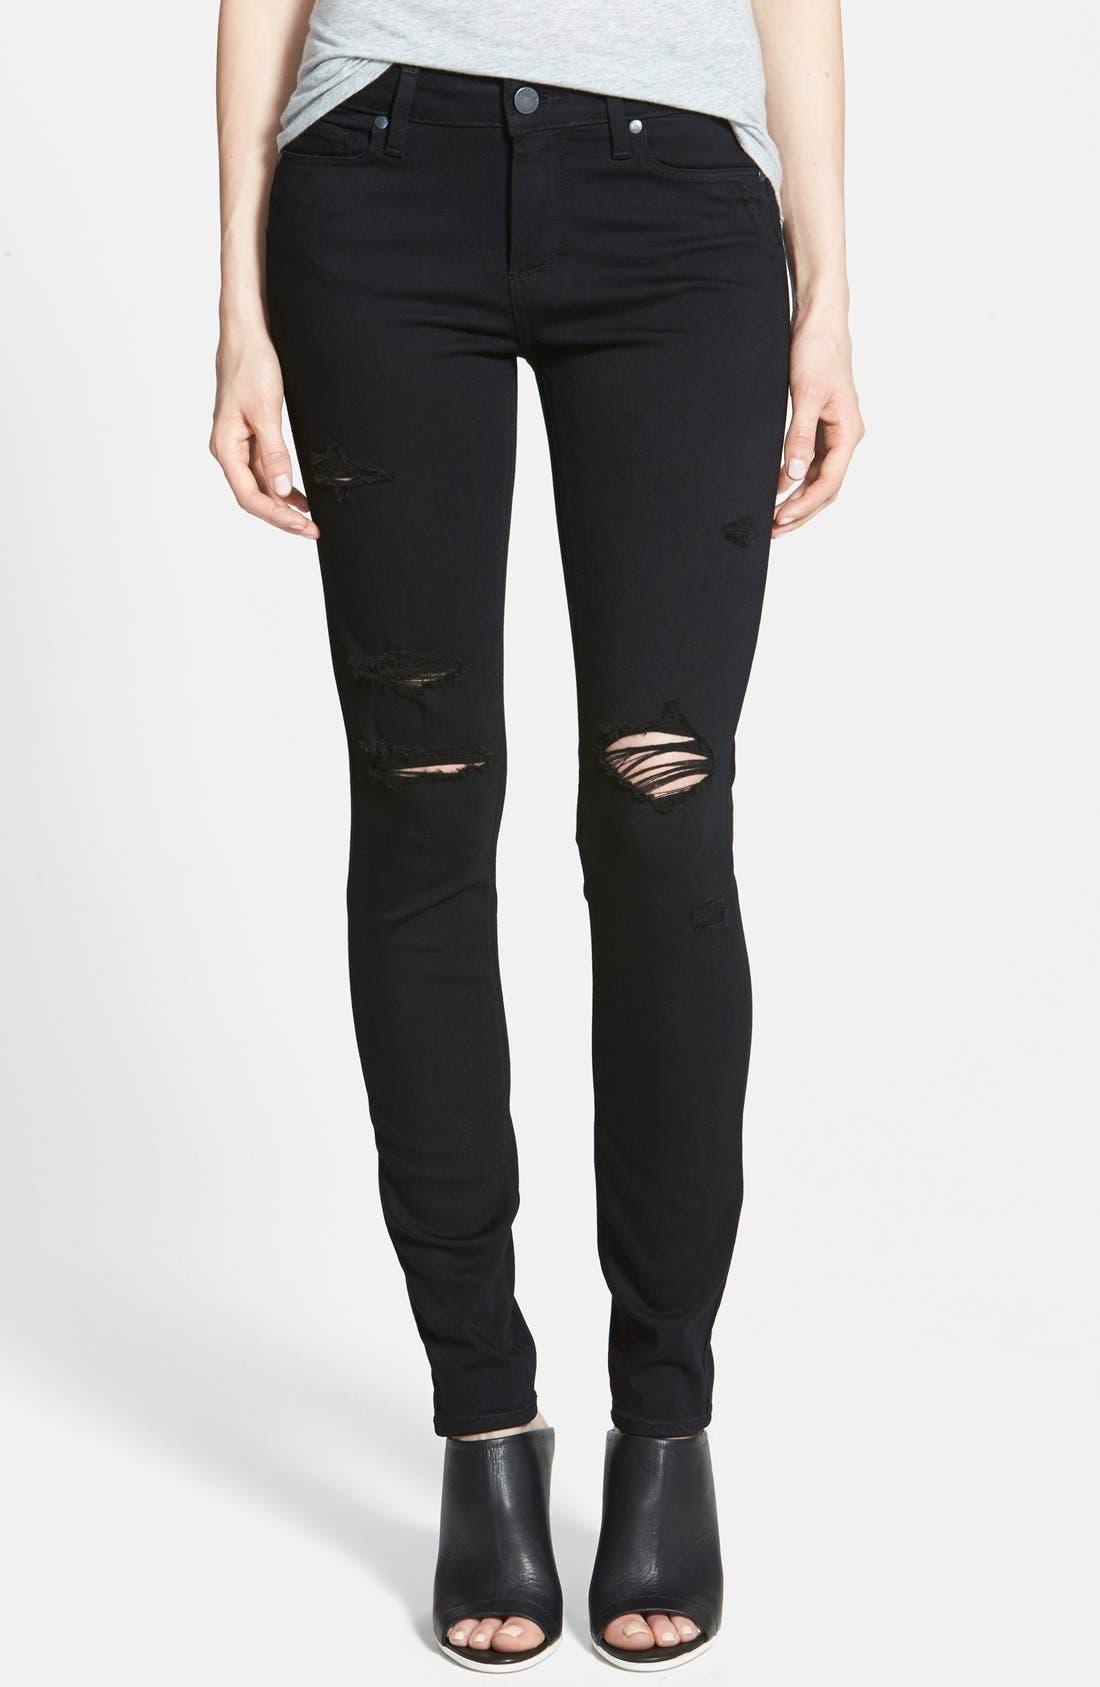 Main Image - PAIGE 'Transcend - Verdugo' Ultra Skinny Jeans